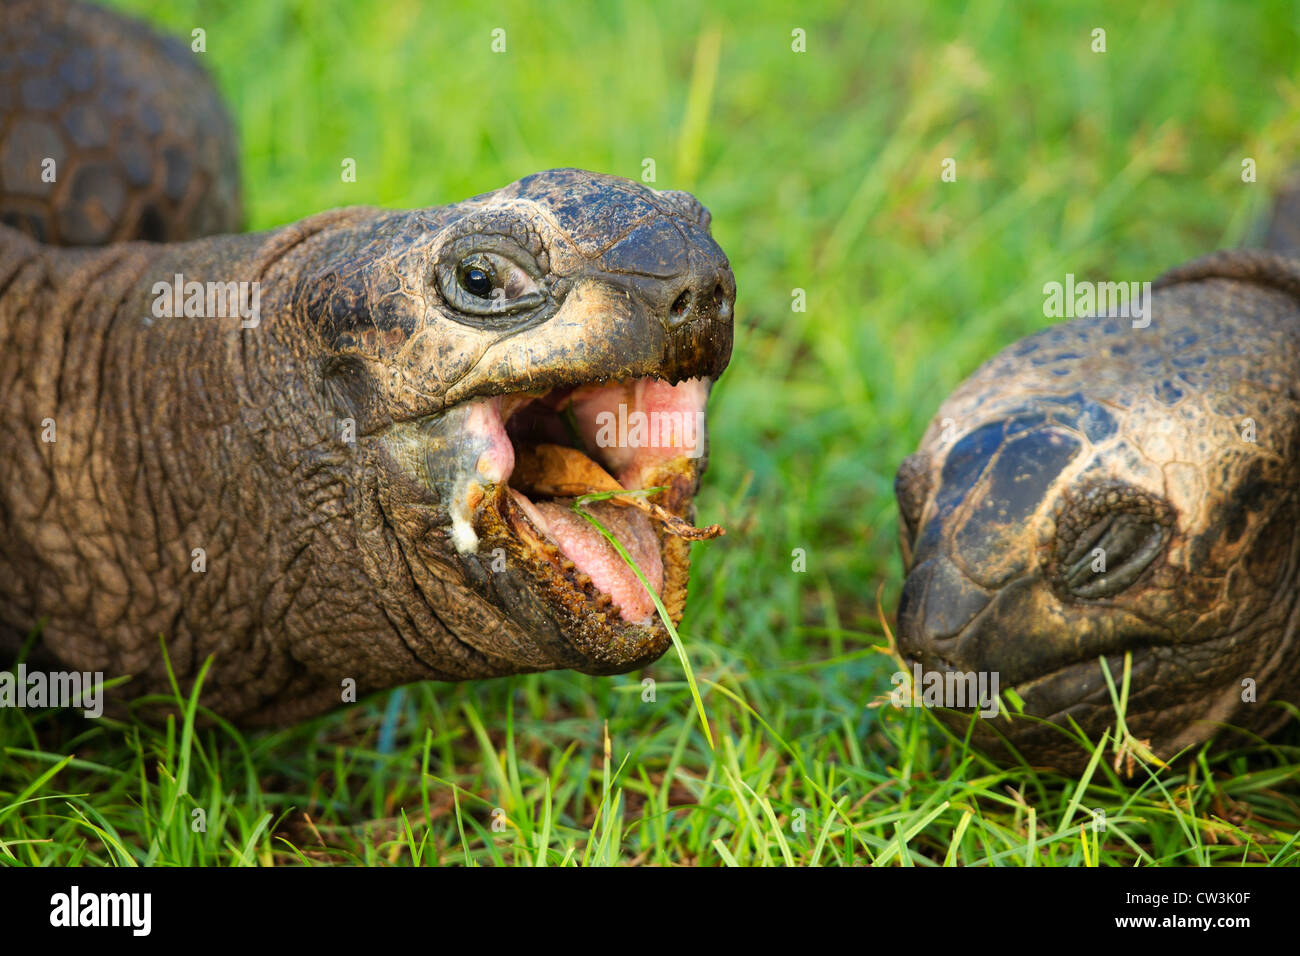 Tortuga Gigante (Geochelone gigantea). Las especies vulnerables. Dist. Islas Seychelles. Imagen De Stock